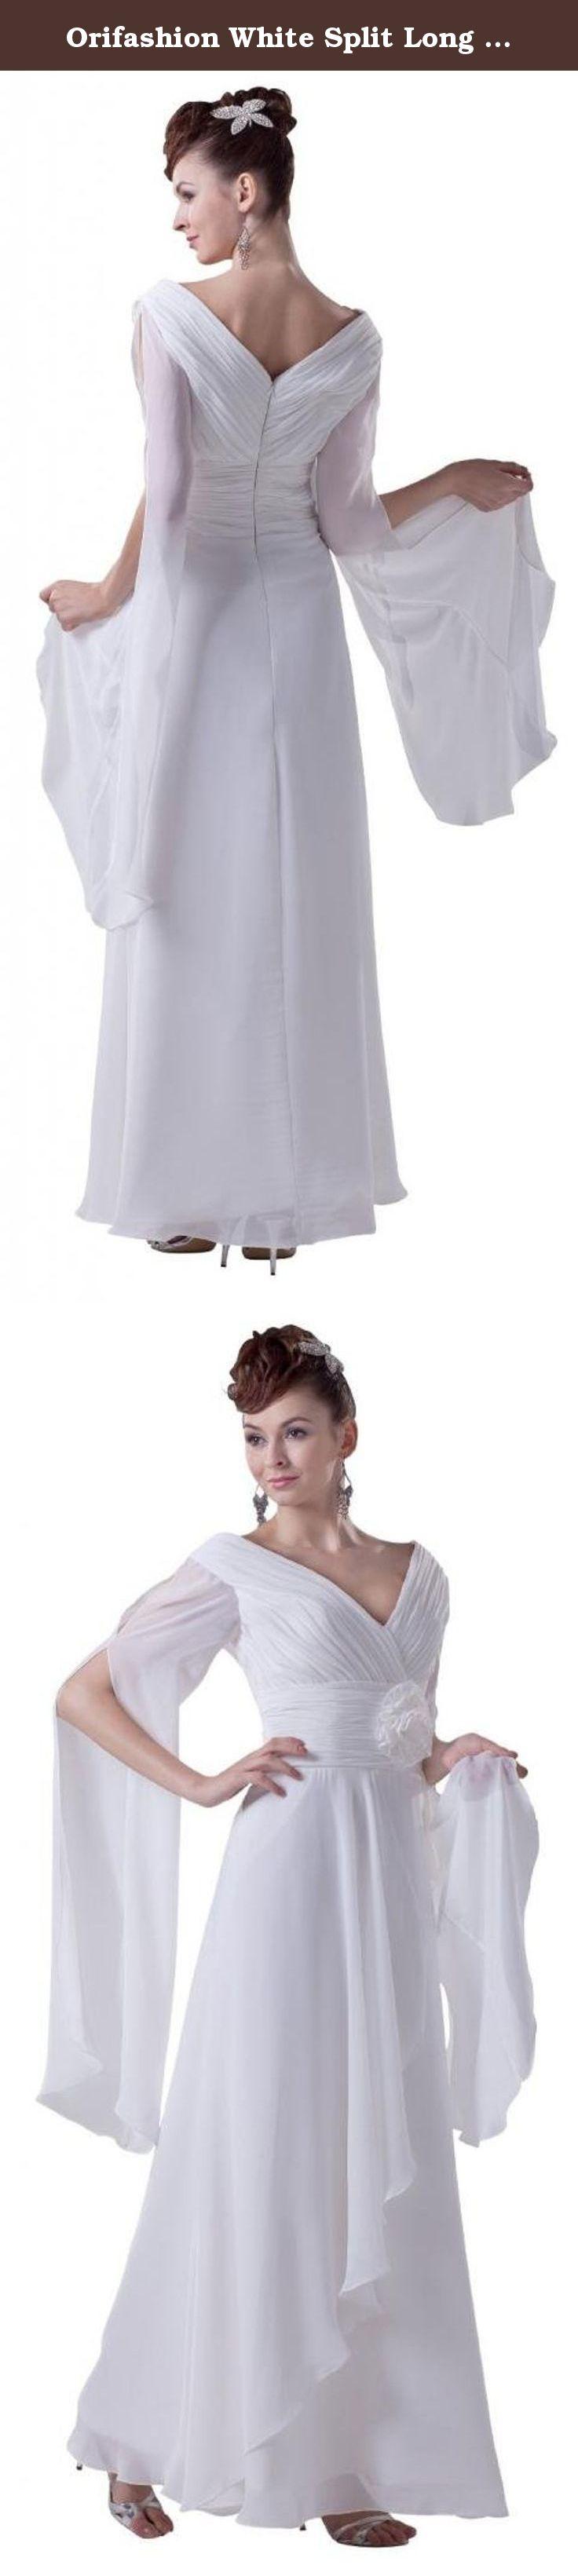 Long sleeve chiffon wedding dress  Orifashion White Split Long Sleeves Ruffle Chiffon Wedding Dress